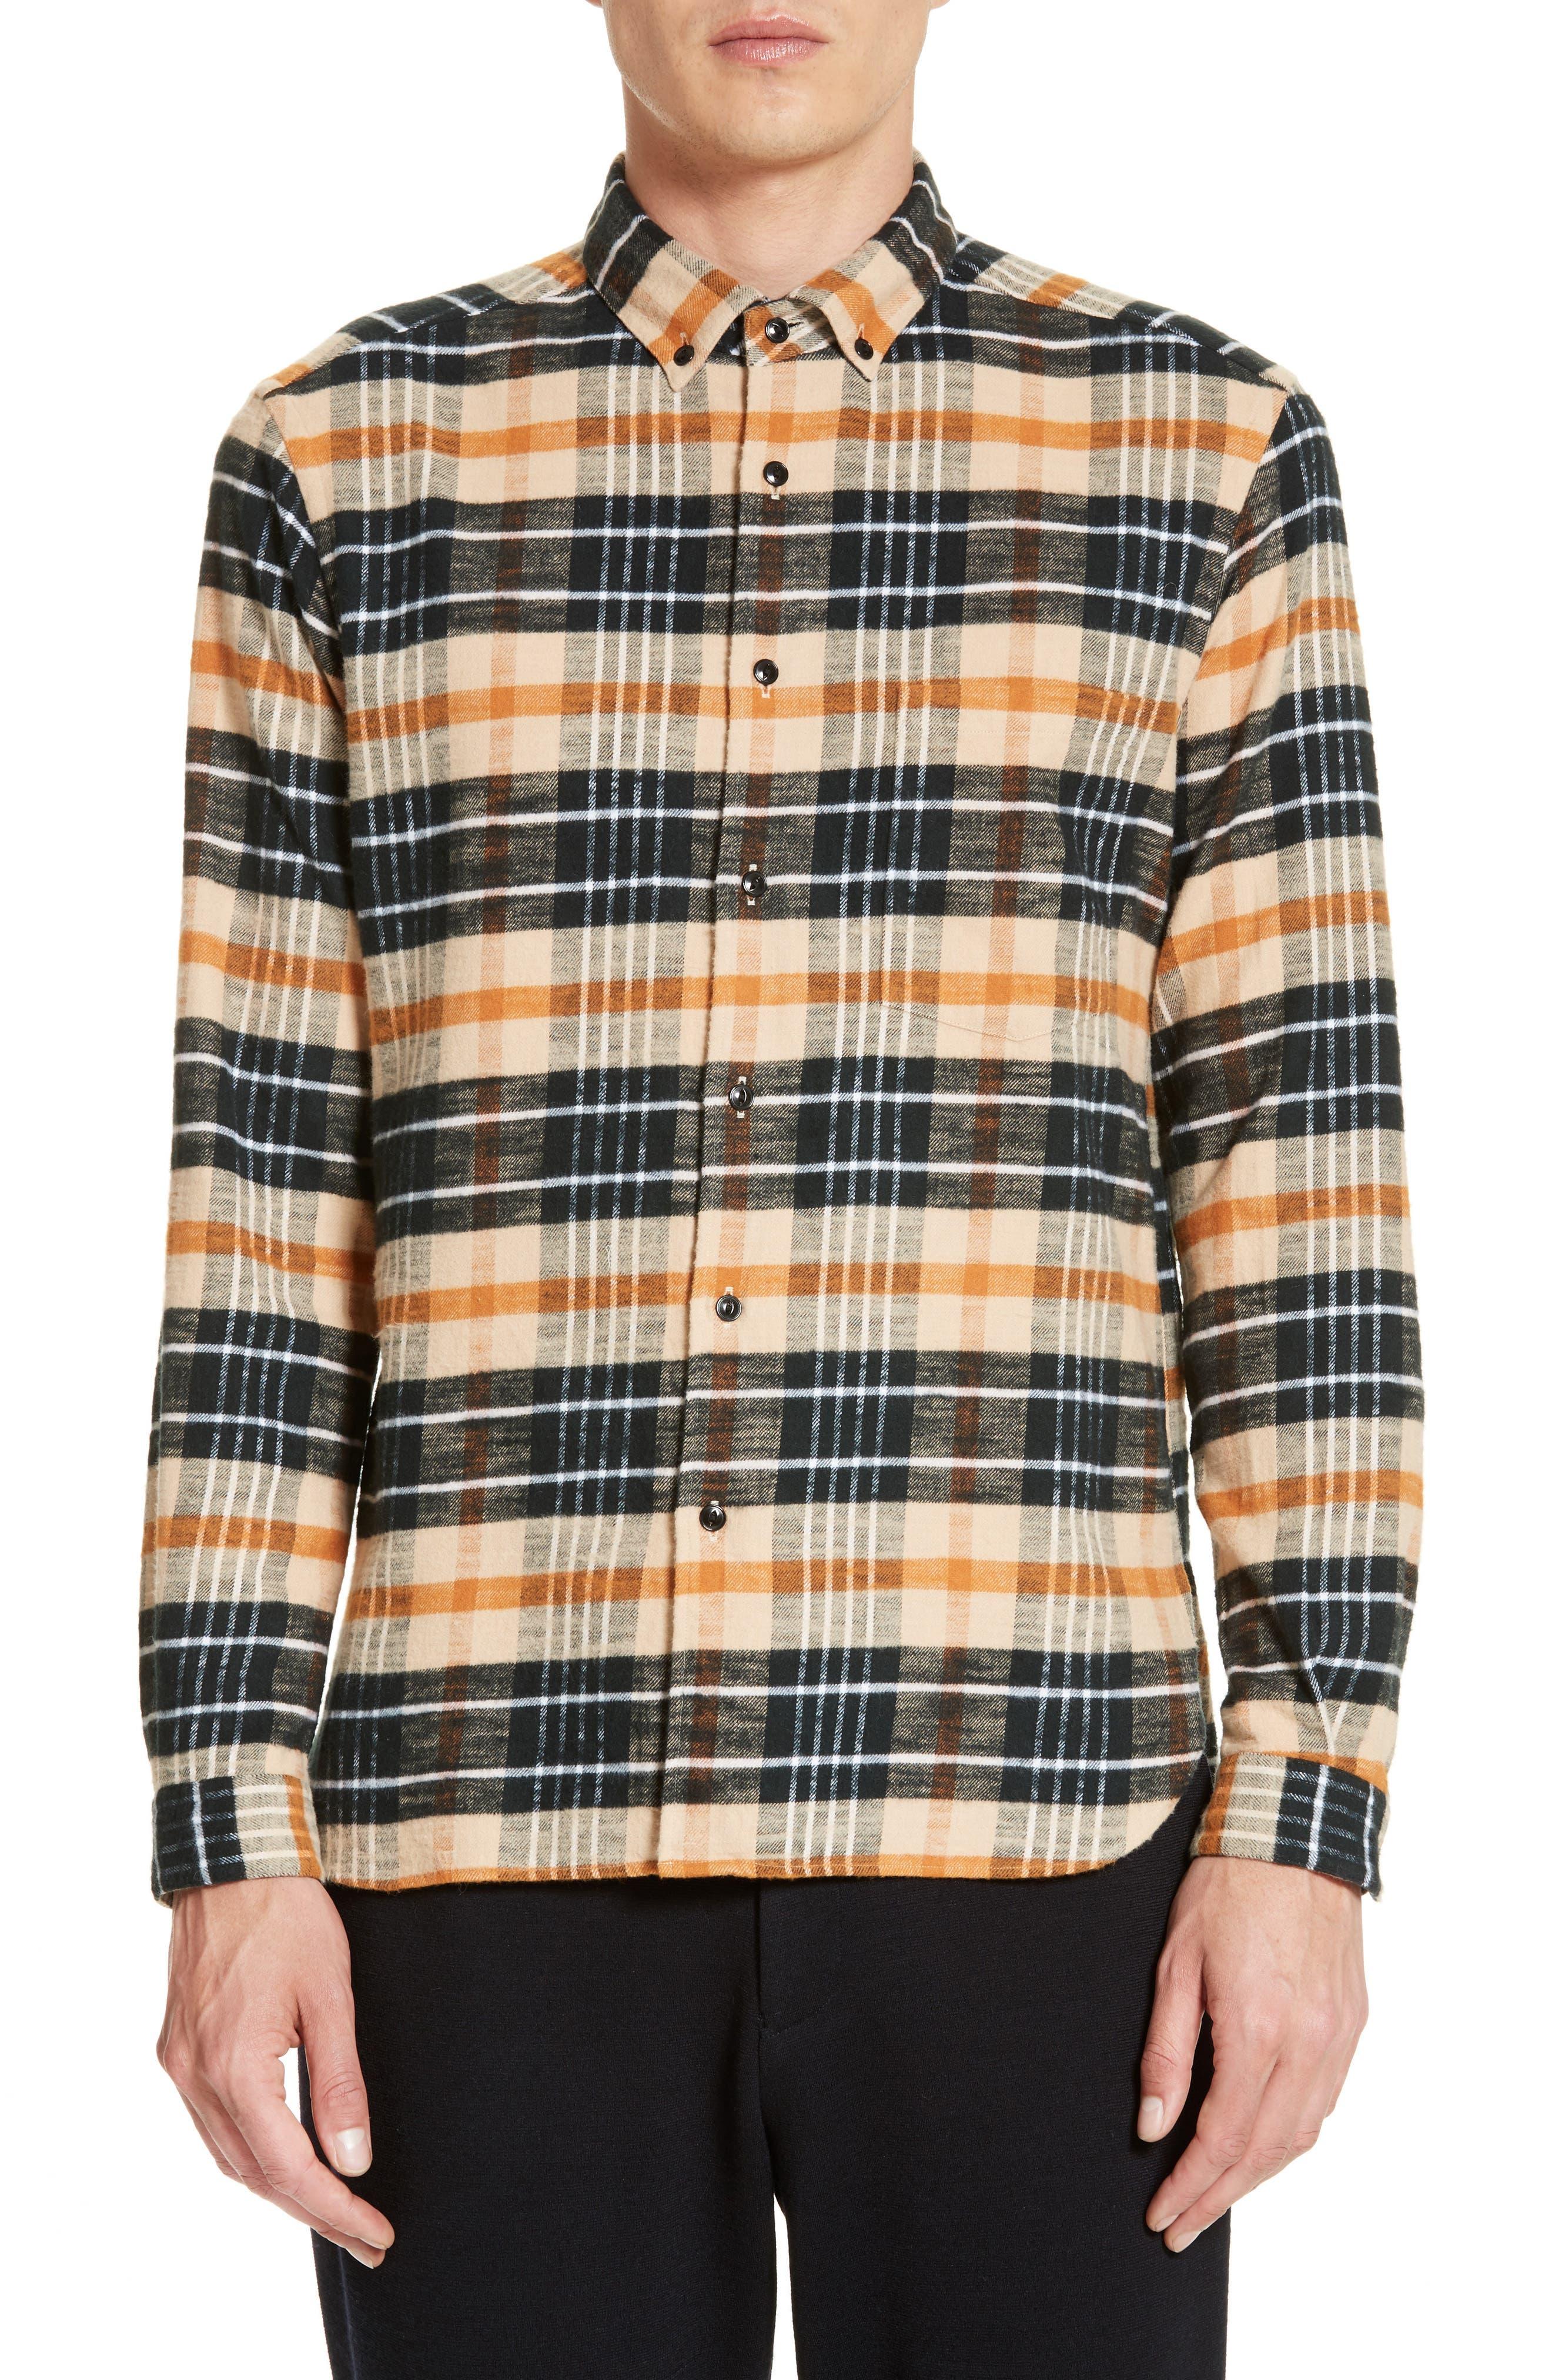 Bradford Plaid Flannel Sport Shirt,                             Main thumbnail 1, color,                             270